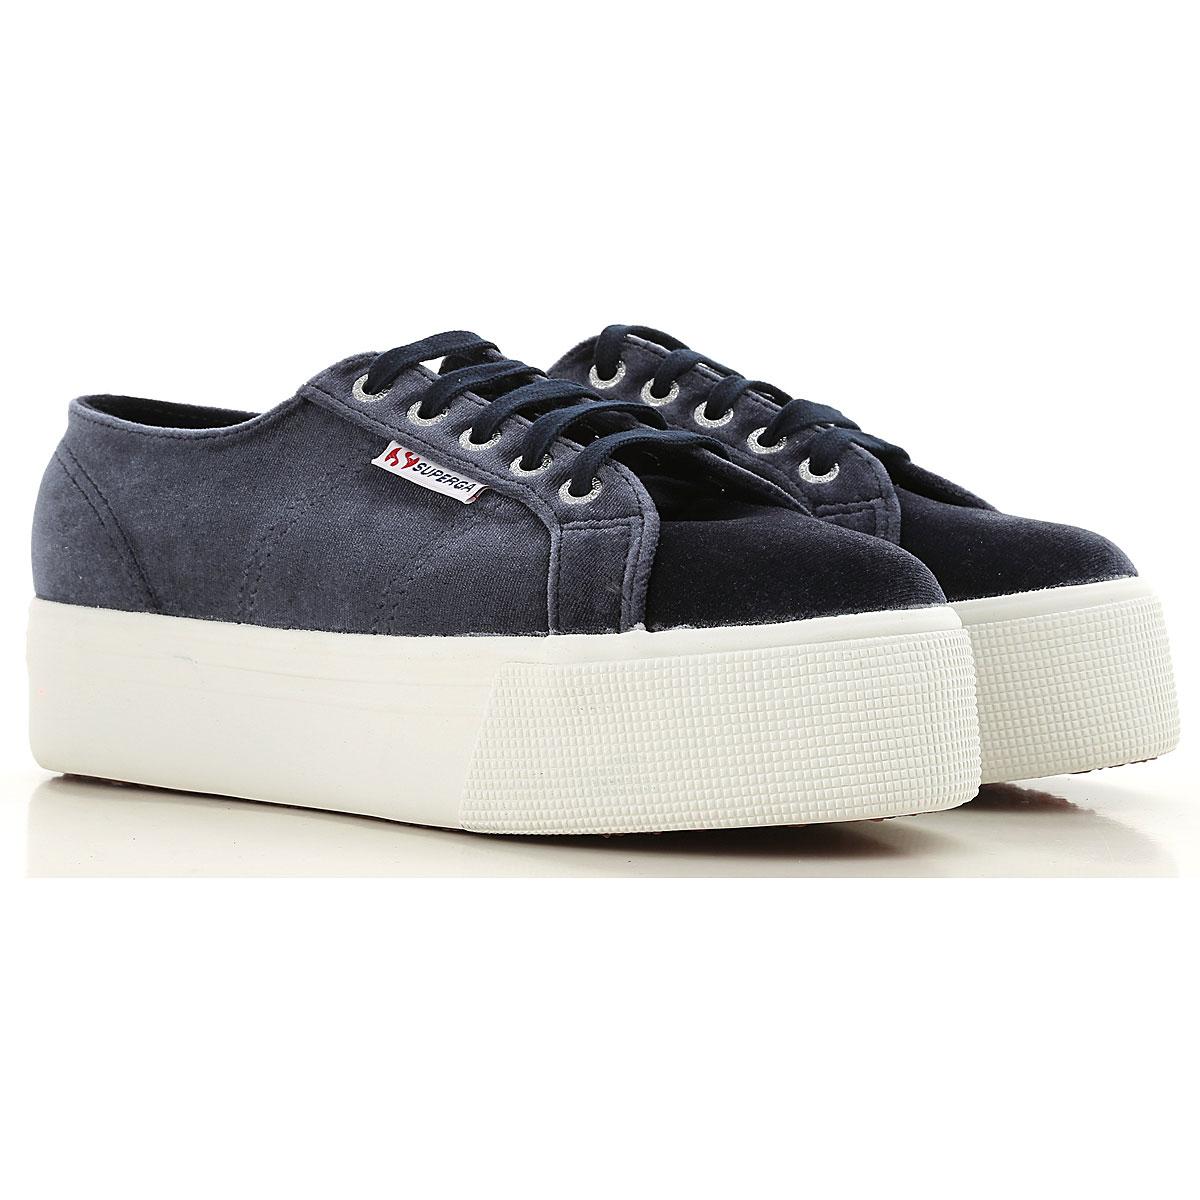 Superga Sneakers for Women On Sale, Grey, Velvet, 2019, ITA 39 - USA 8.5 - UK 6 ITA 41 - USA 10.5 - UK 8